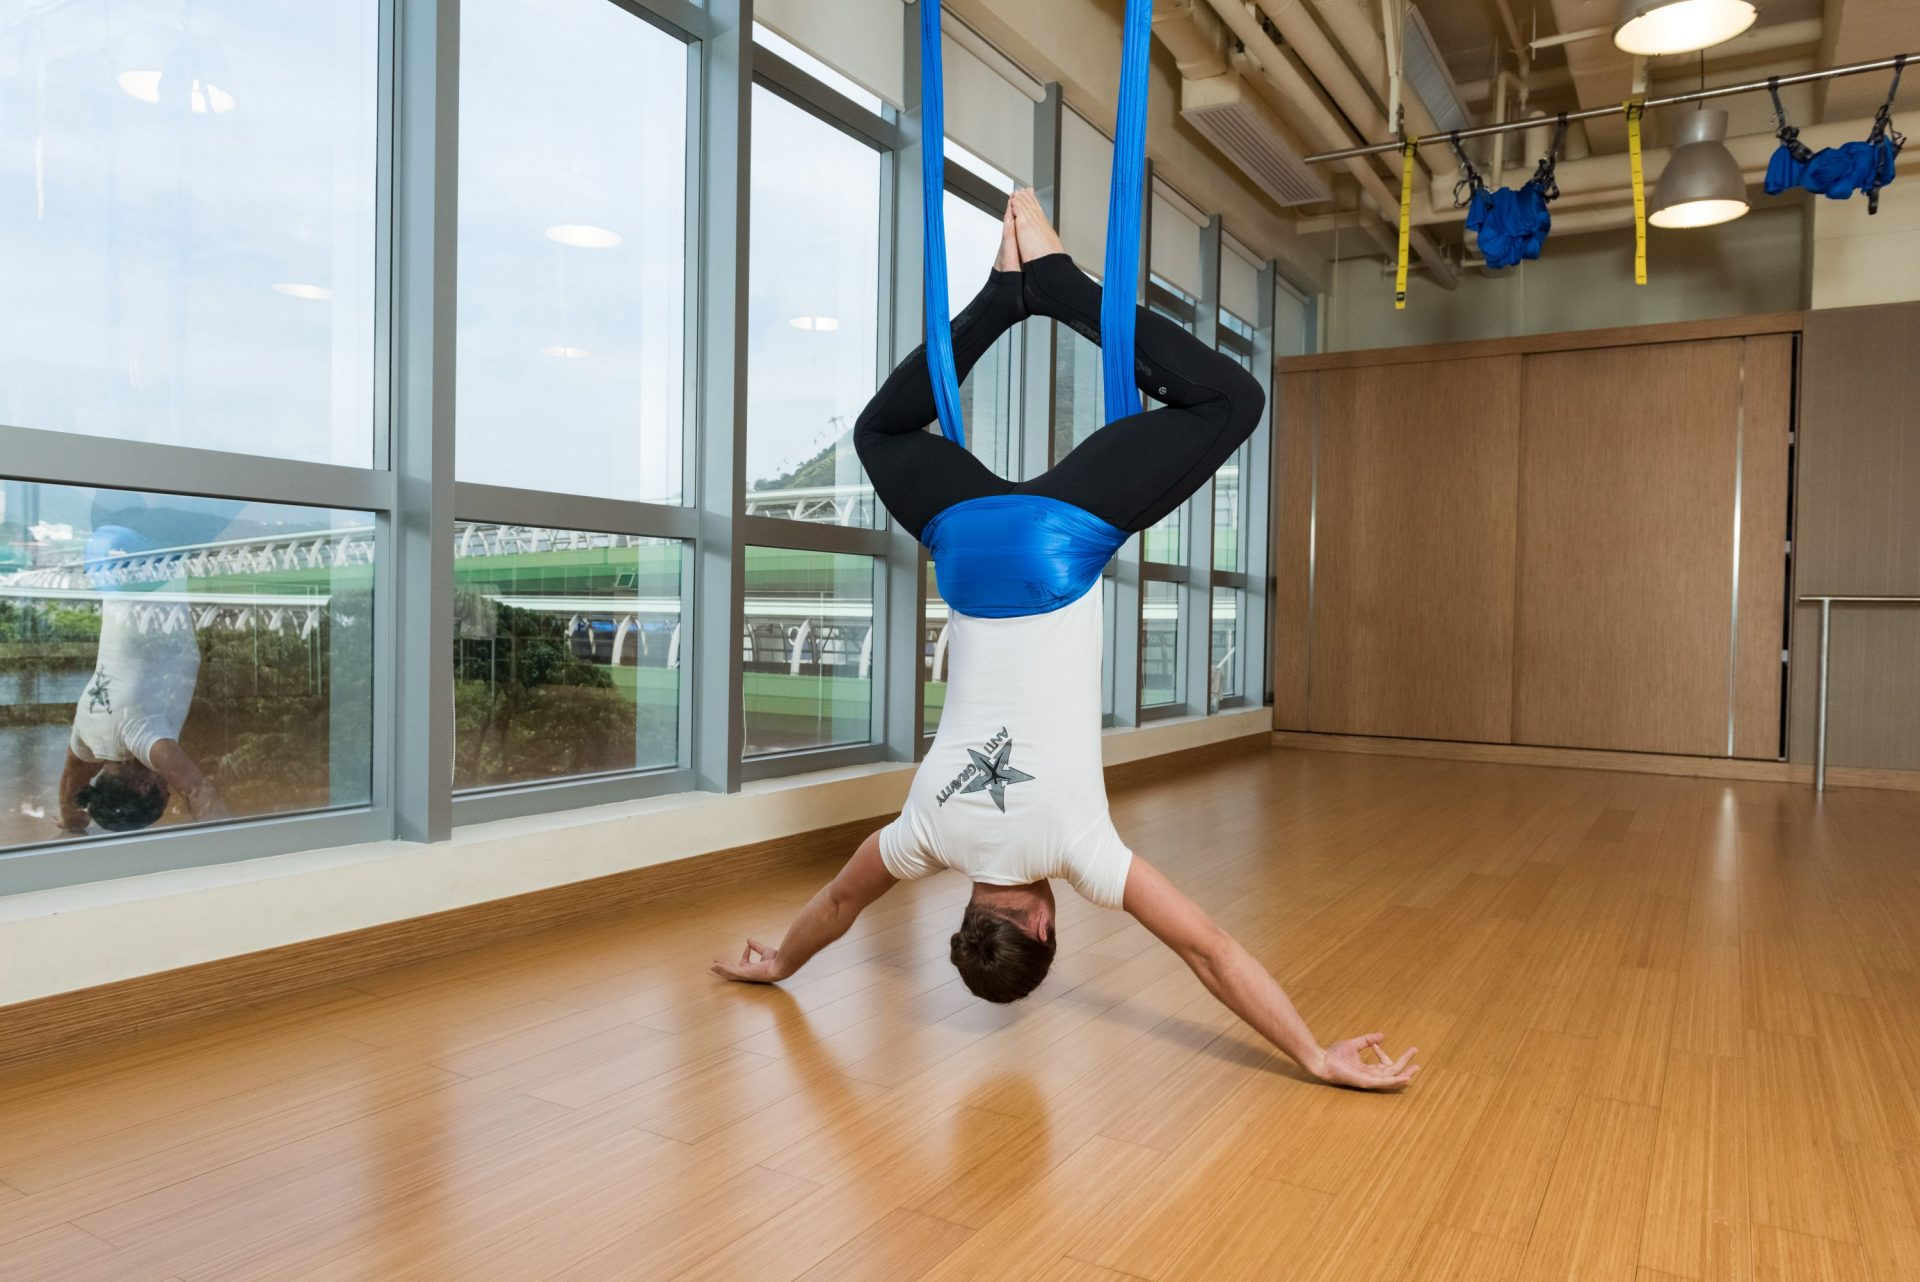 Antigravity fitness - spiderman pose